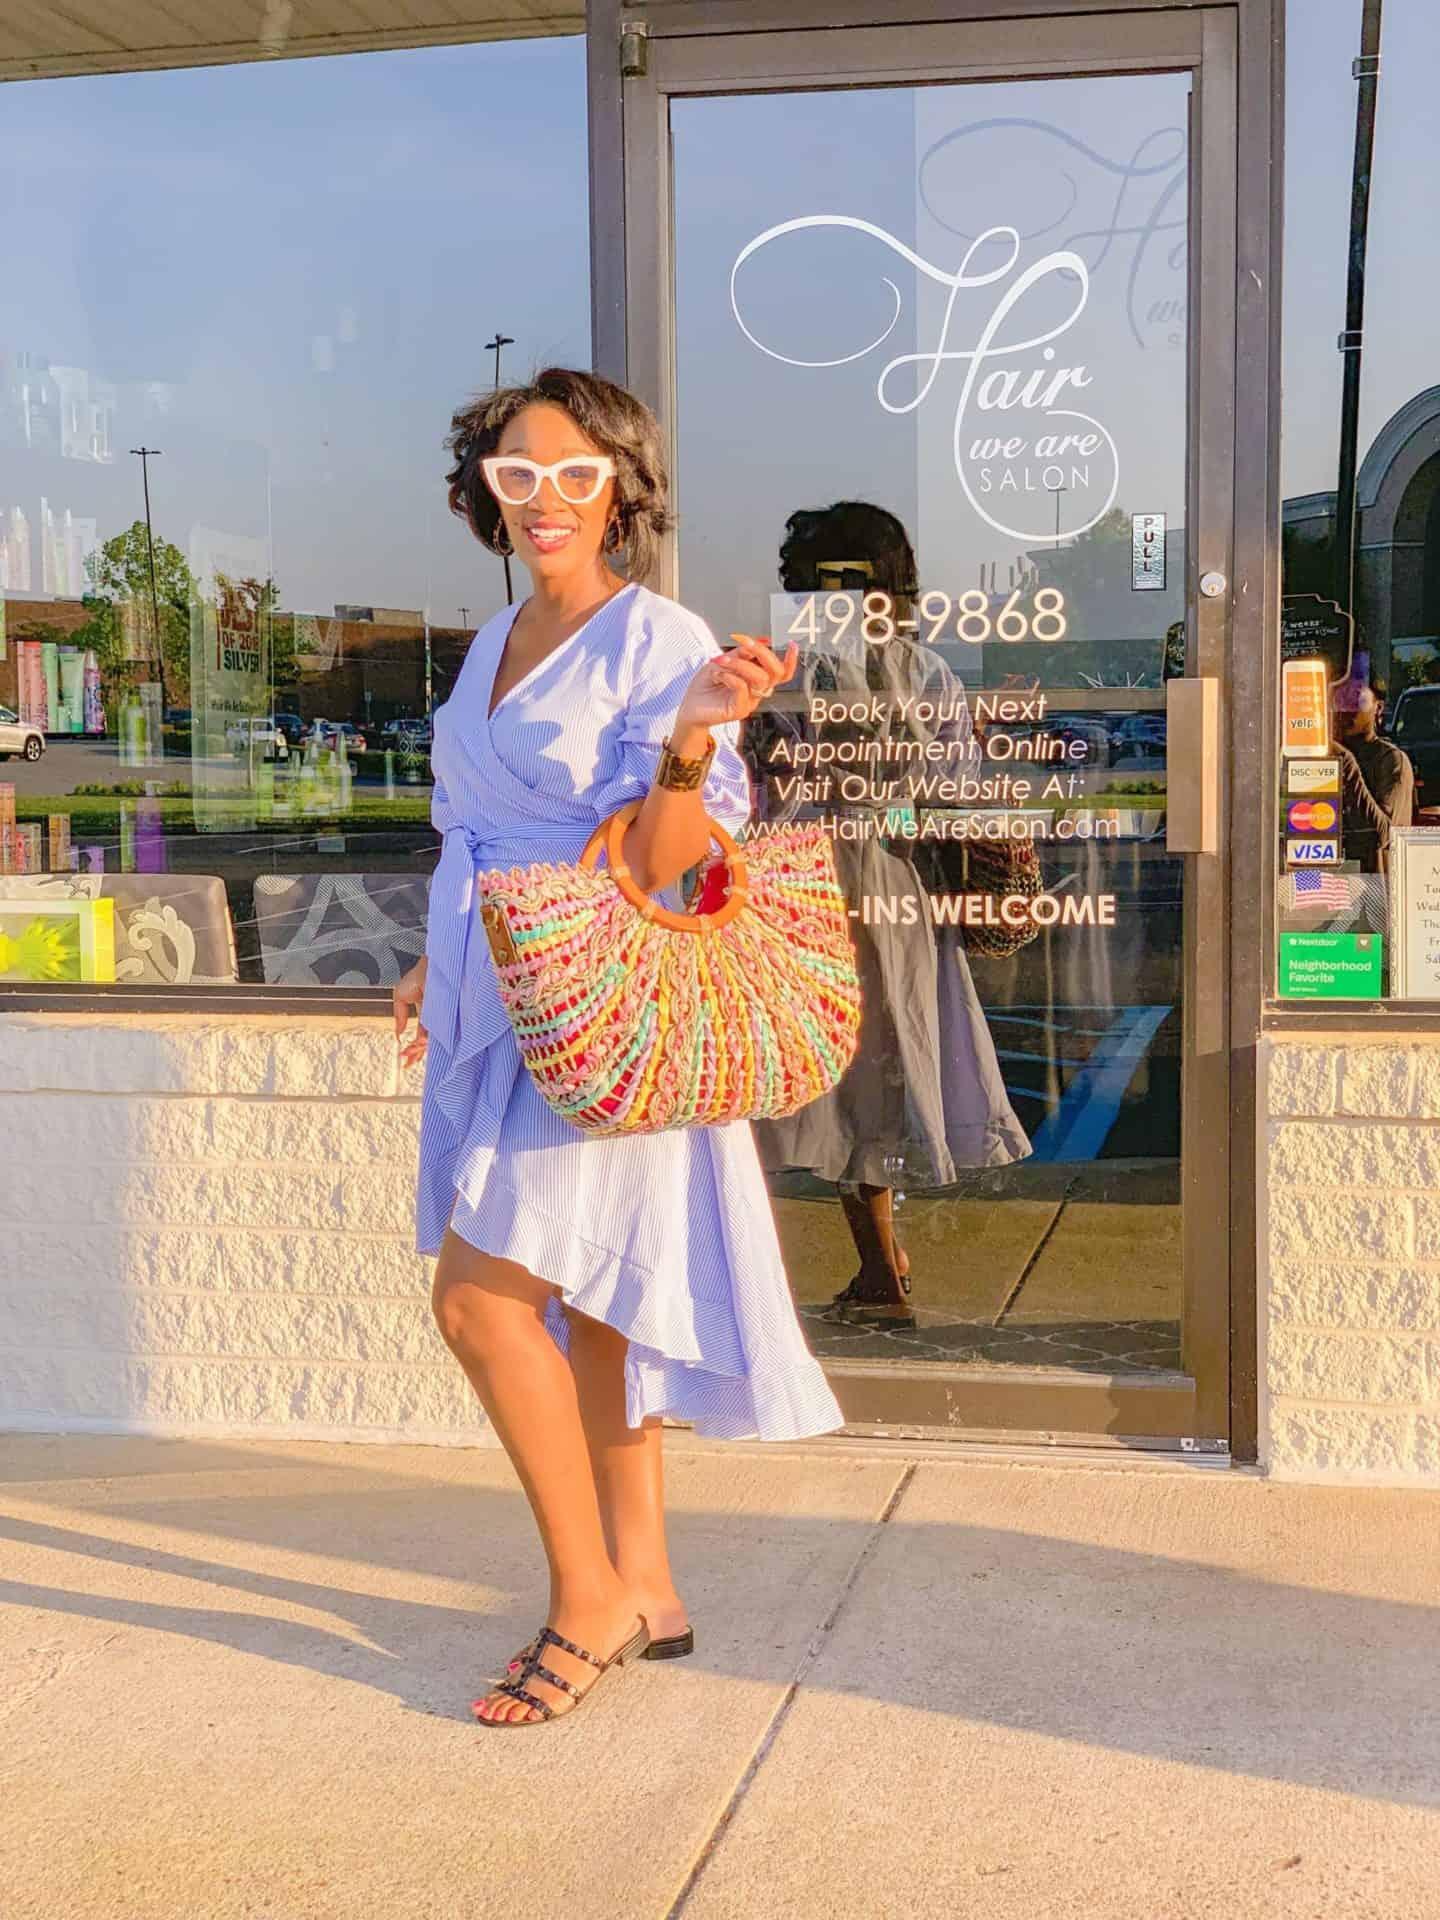 Shaunda Necole - In Virginia Beach at Hair We Are Salon, Stylist- Destiny Moody, SheIn dress, Patricia Nash handbag